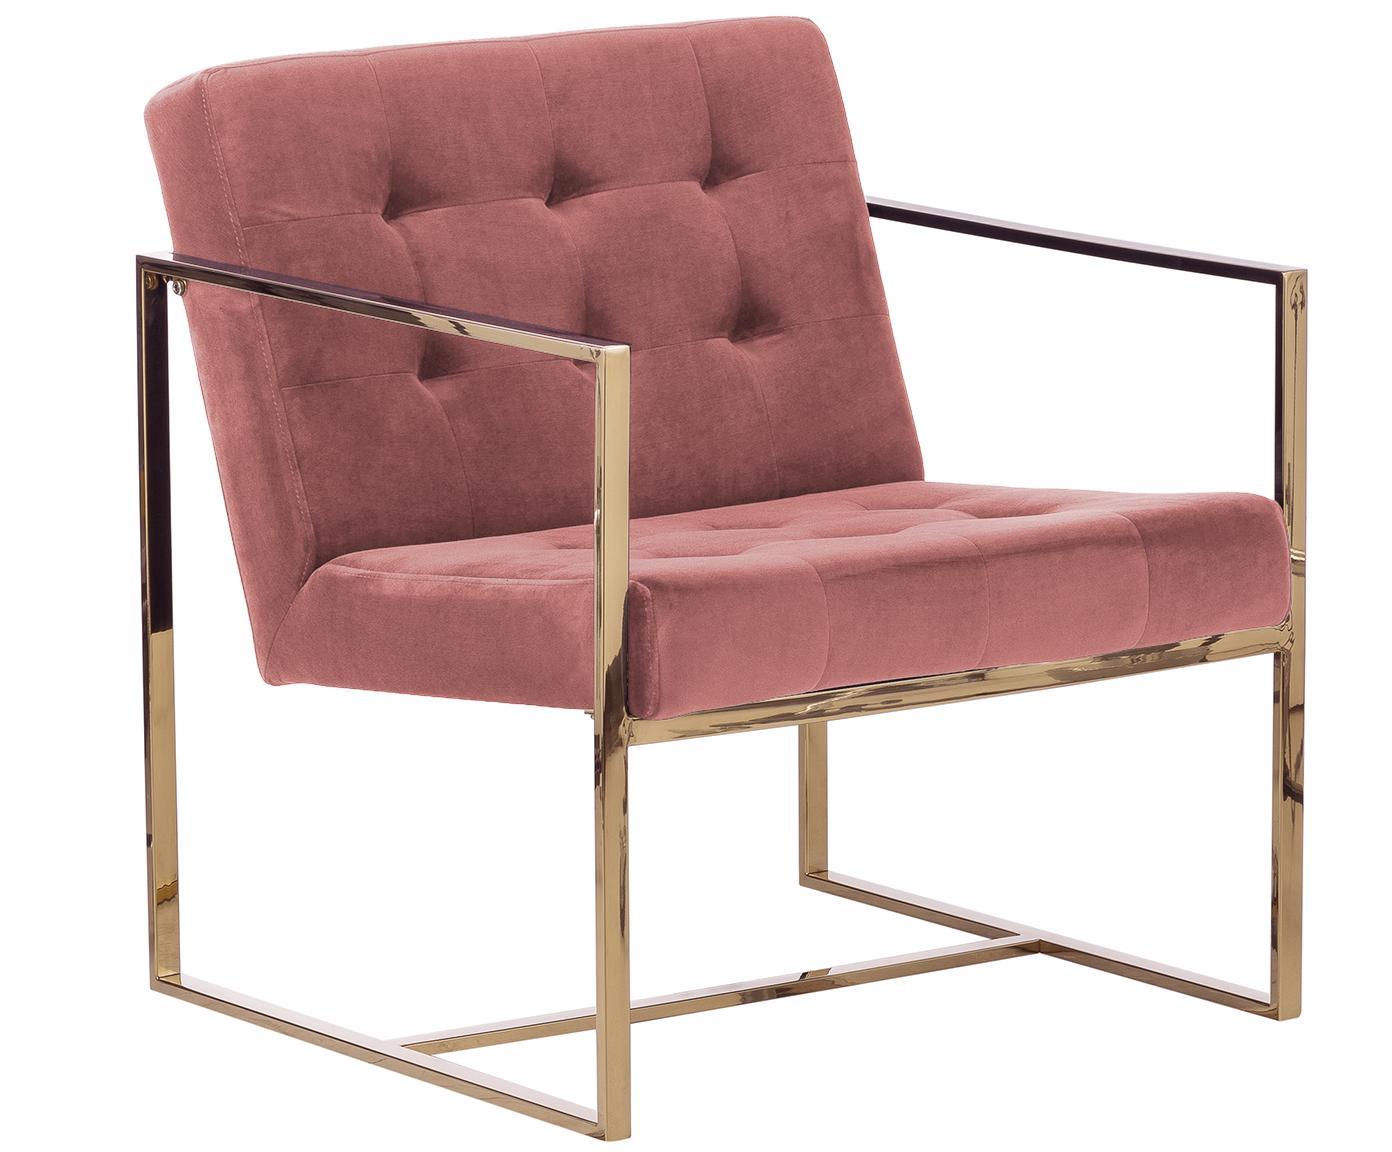 Fluwelen fauteuil Manhattan, Bekleding: fluweel (polyester), Frame: gecoat metaal, Oudroze, B 70 x D 72 cm